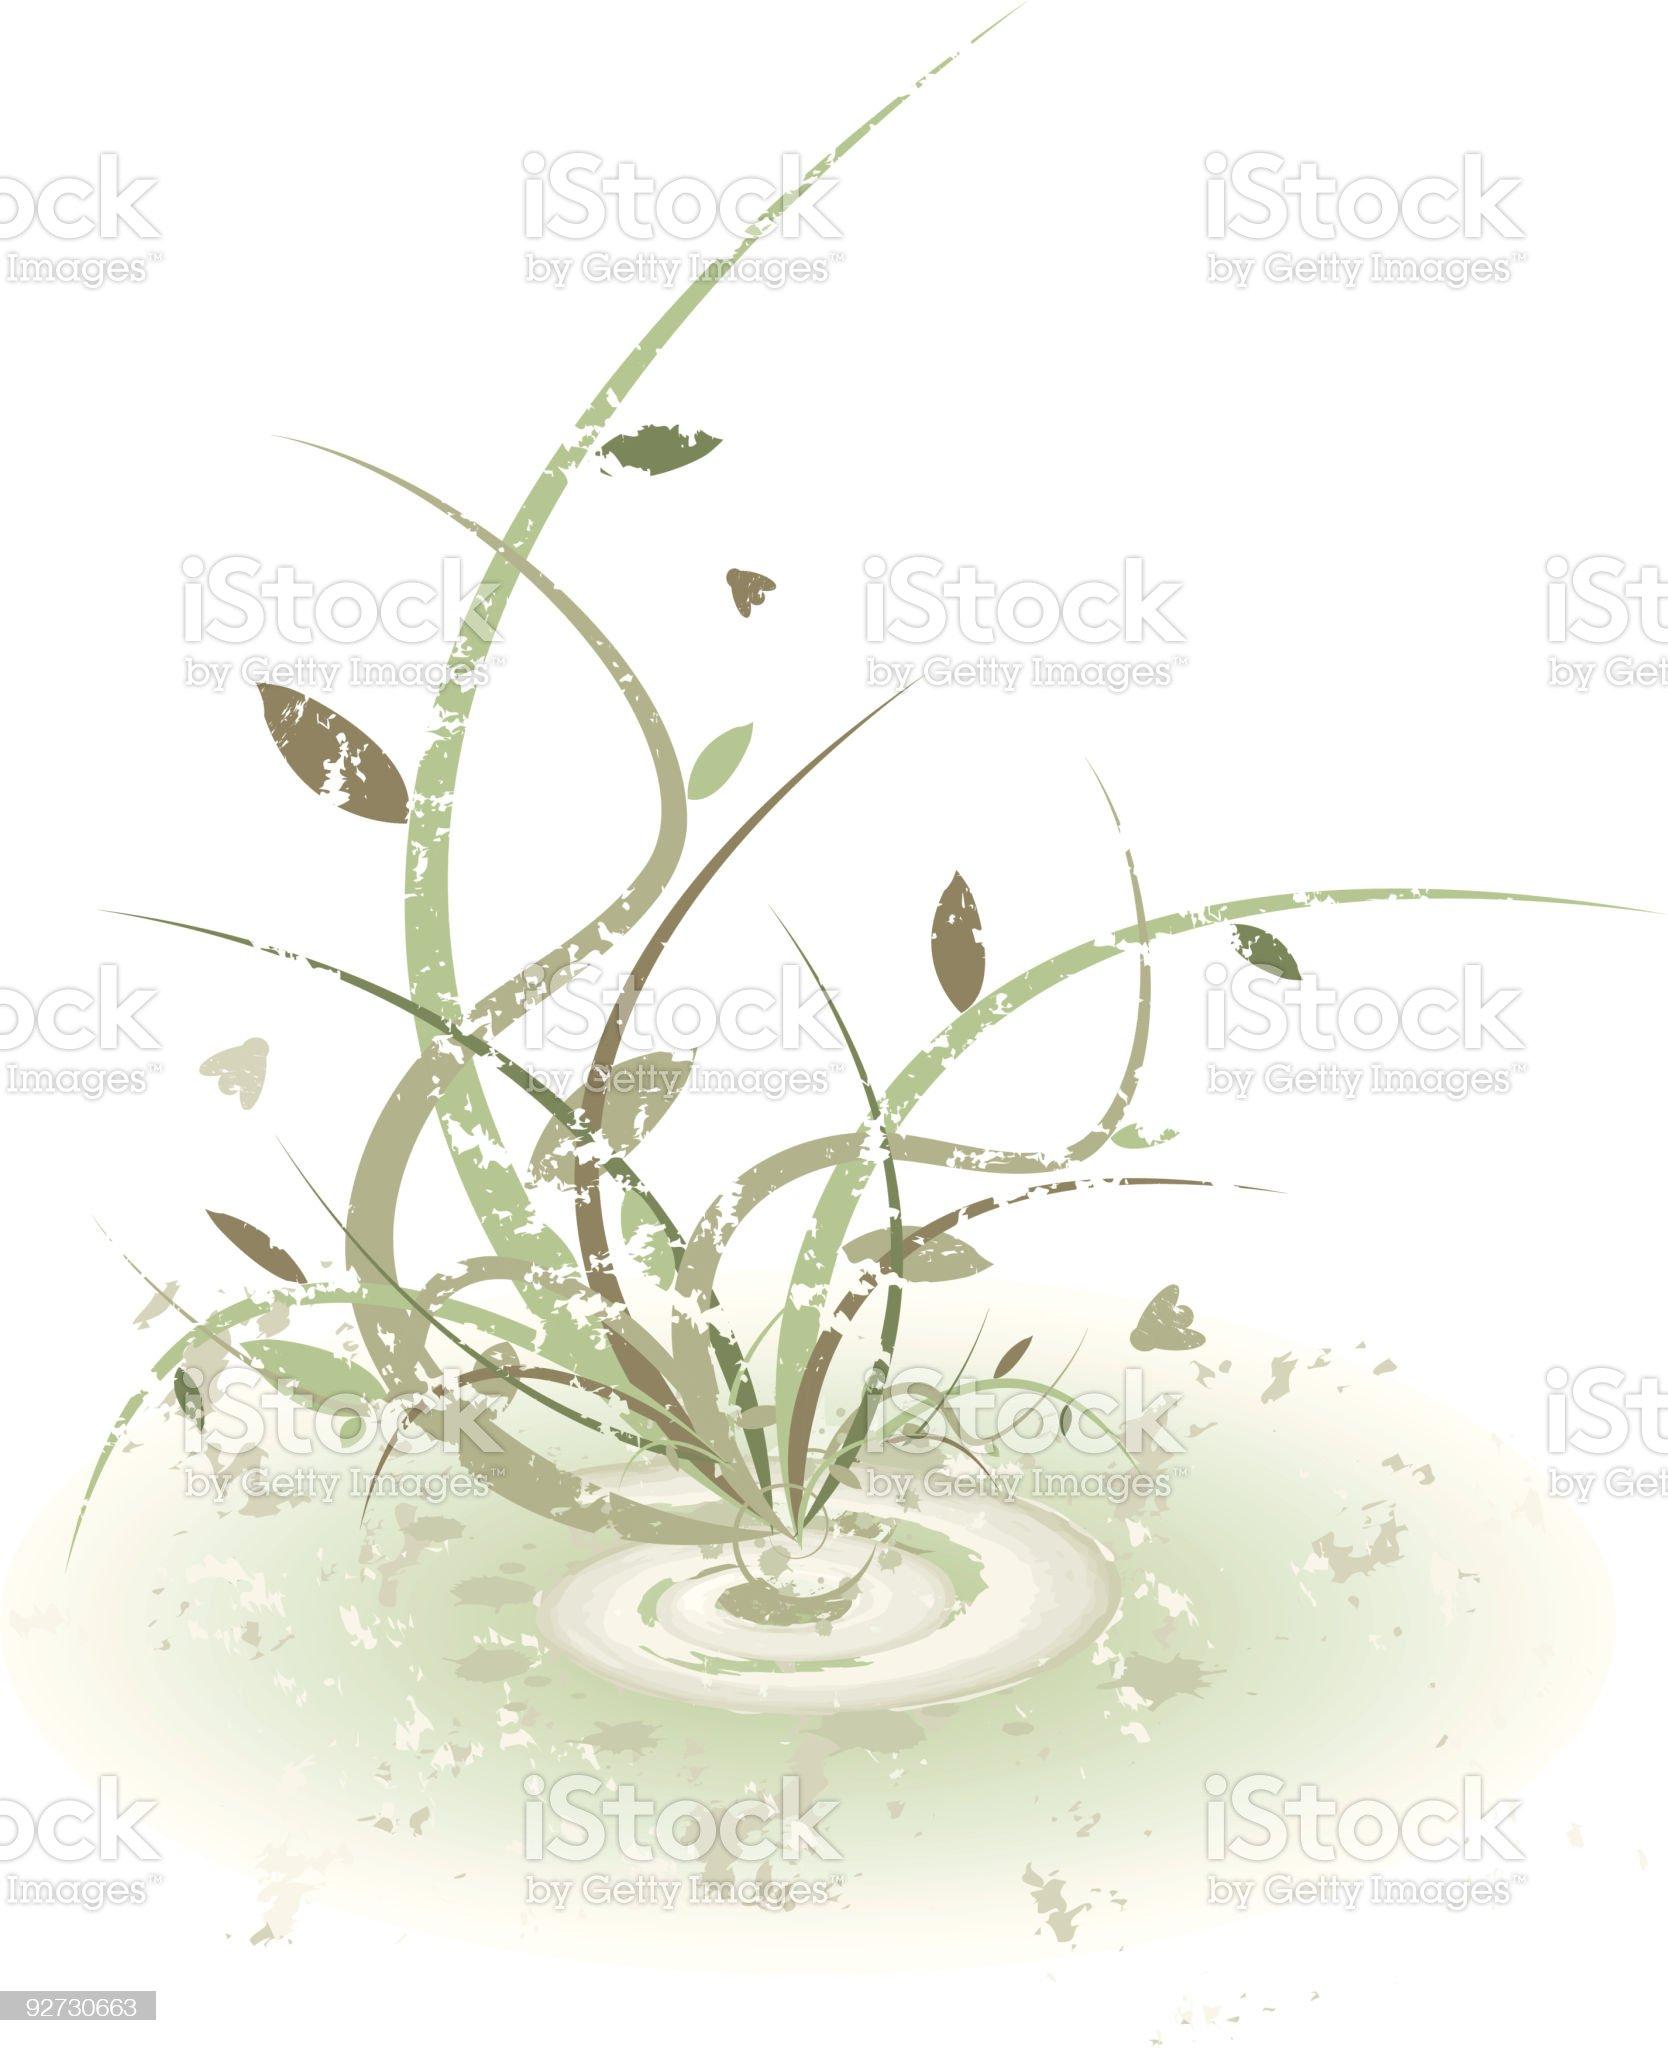 Grunge plant design royalty-free stock vector art